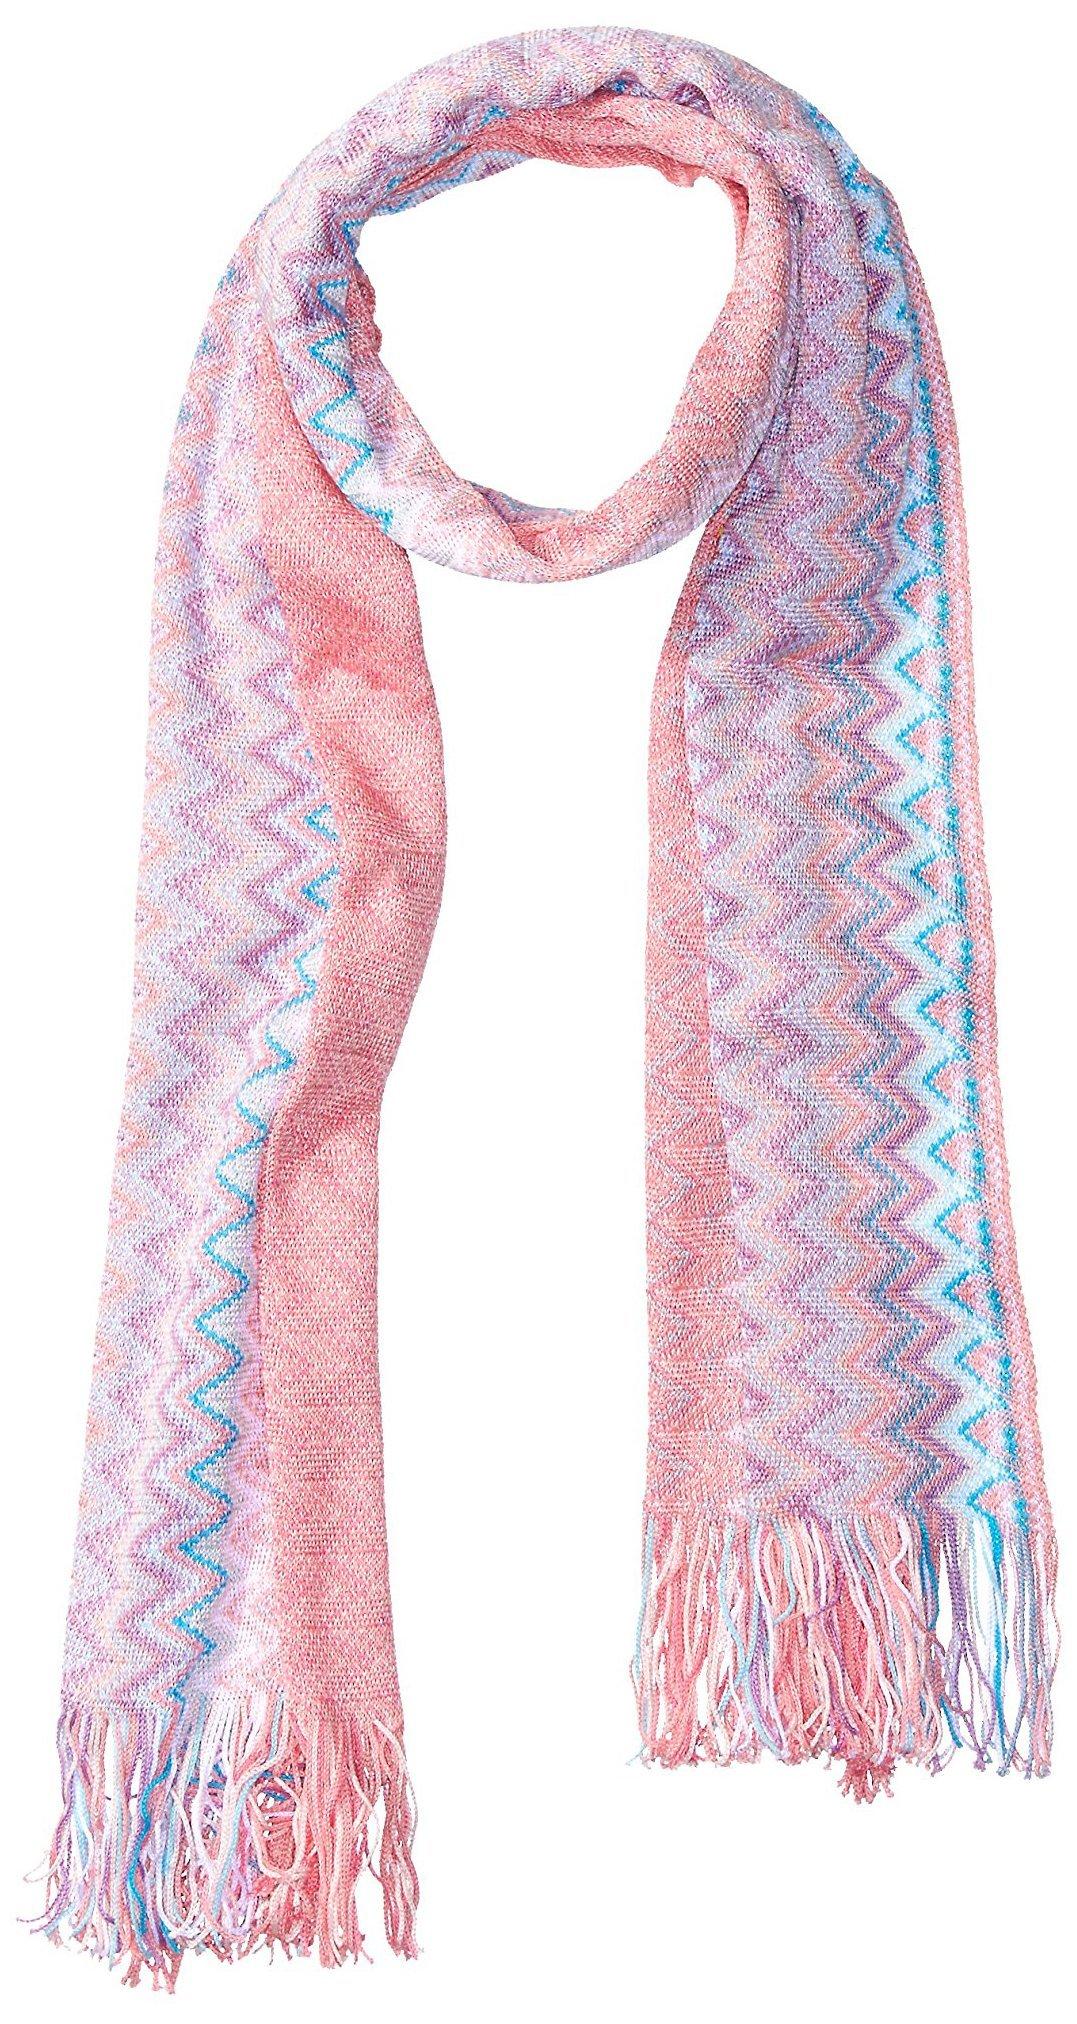 MISSONI Women's Zig Zag Scarf, Pink